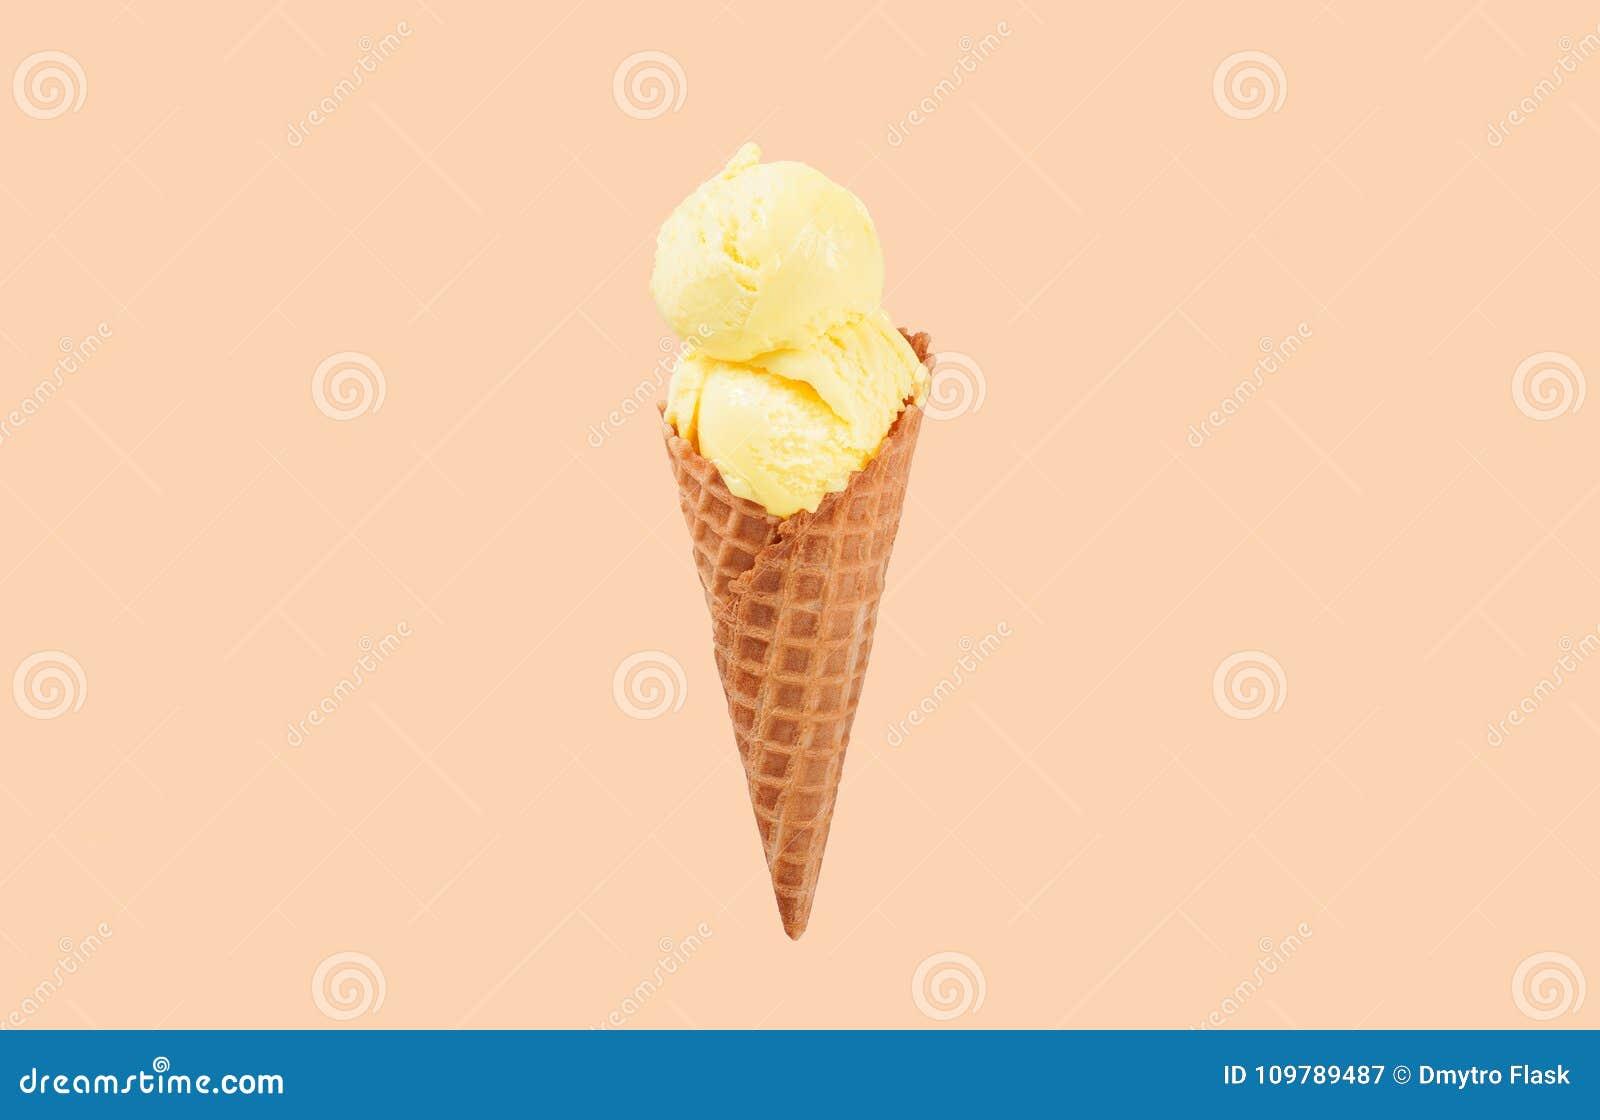 Мороженое на белом цвете